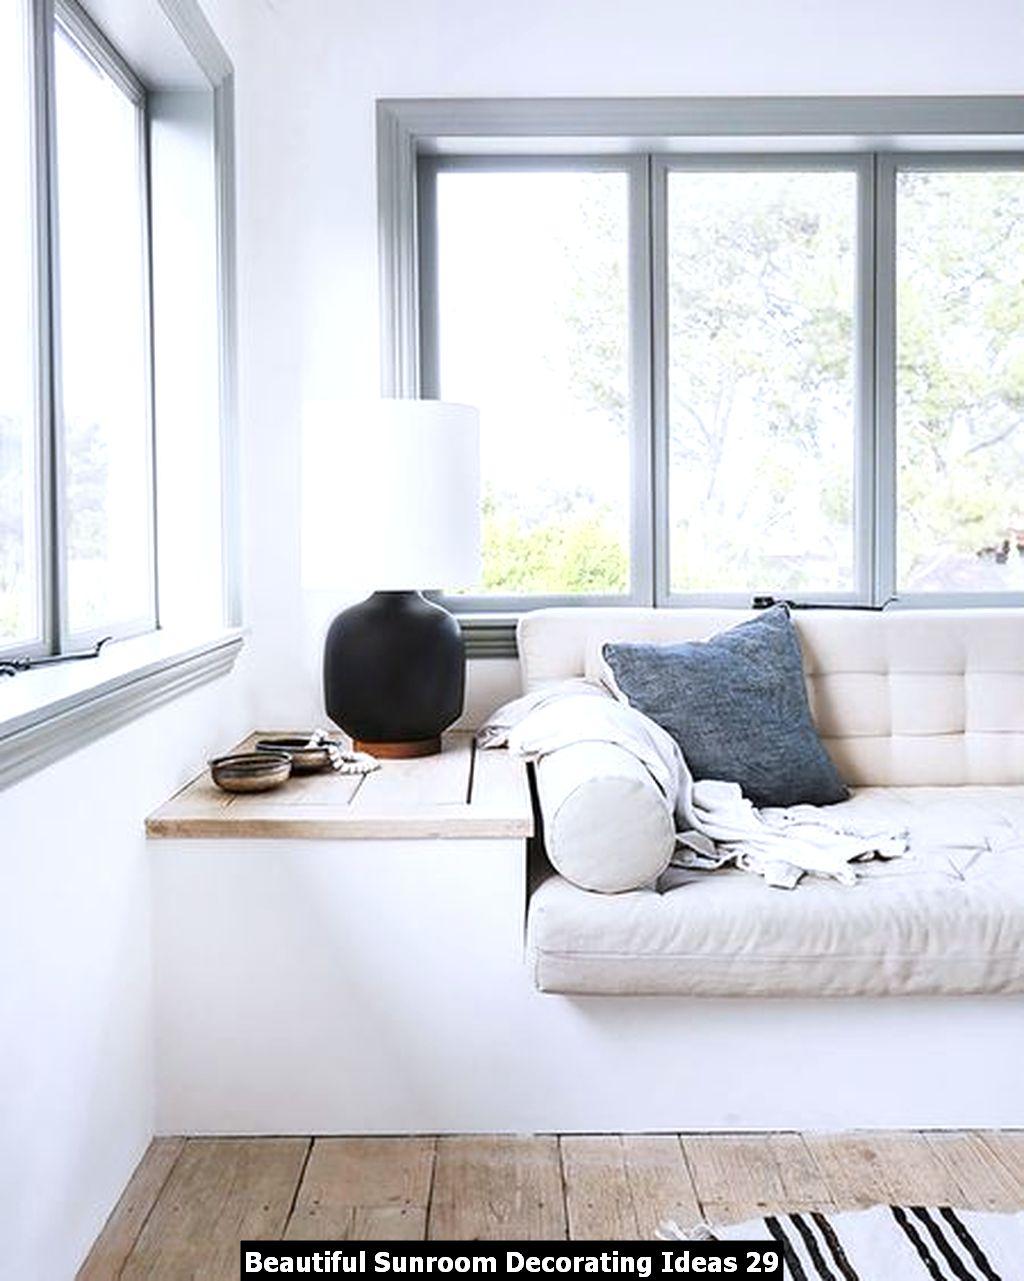 Beautiful Sunroom Decorating Ideas 29